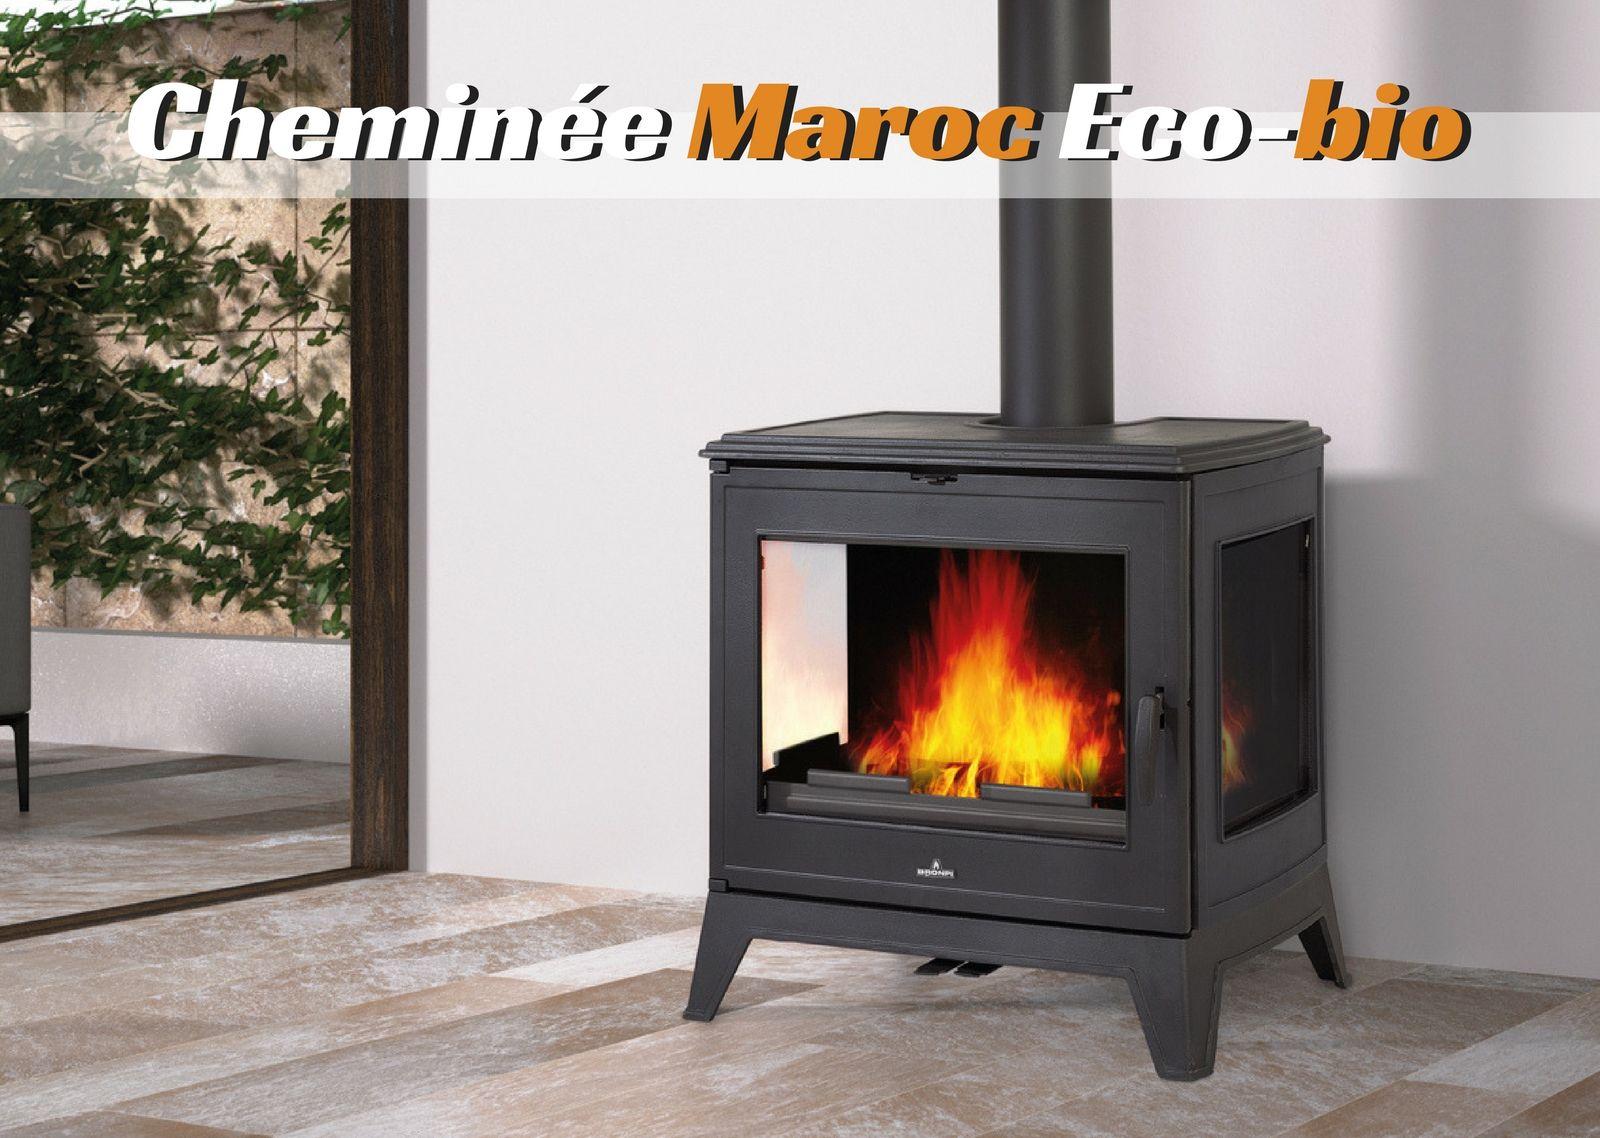 Epingle Sur Cheminee Maroc Eco Bio